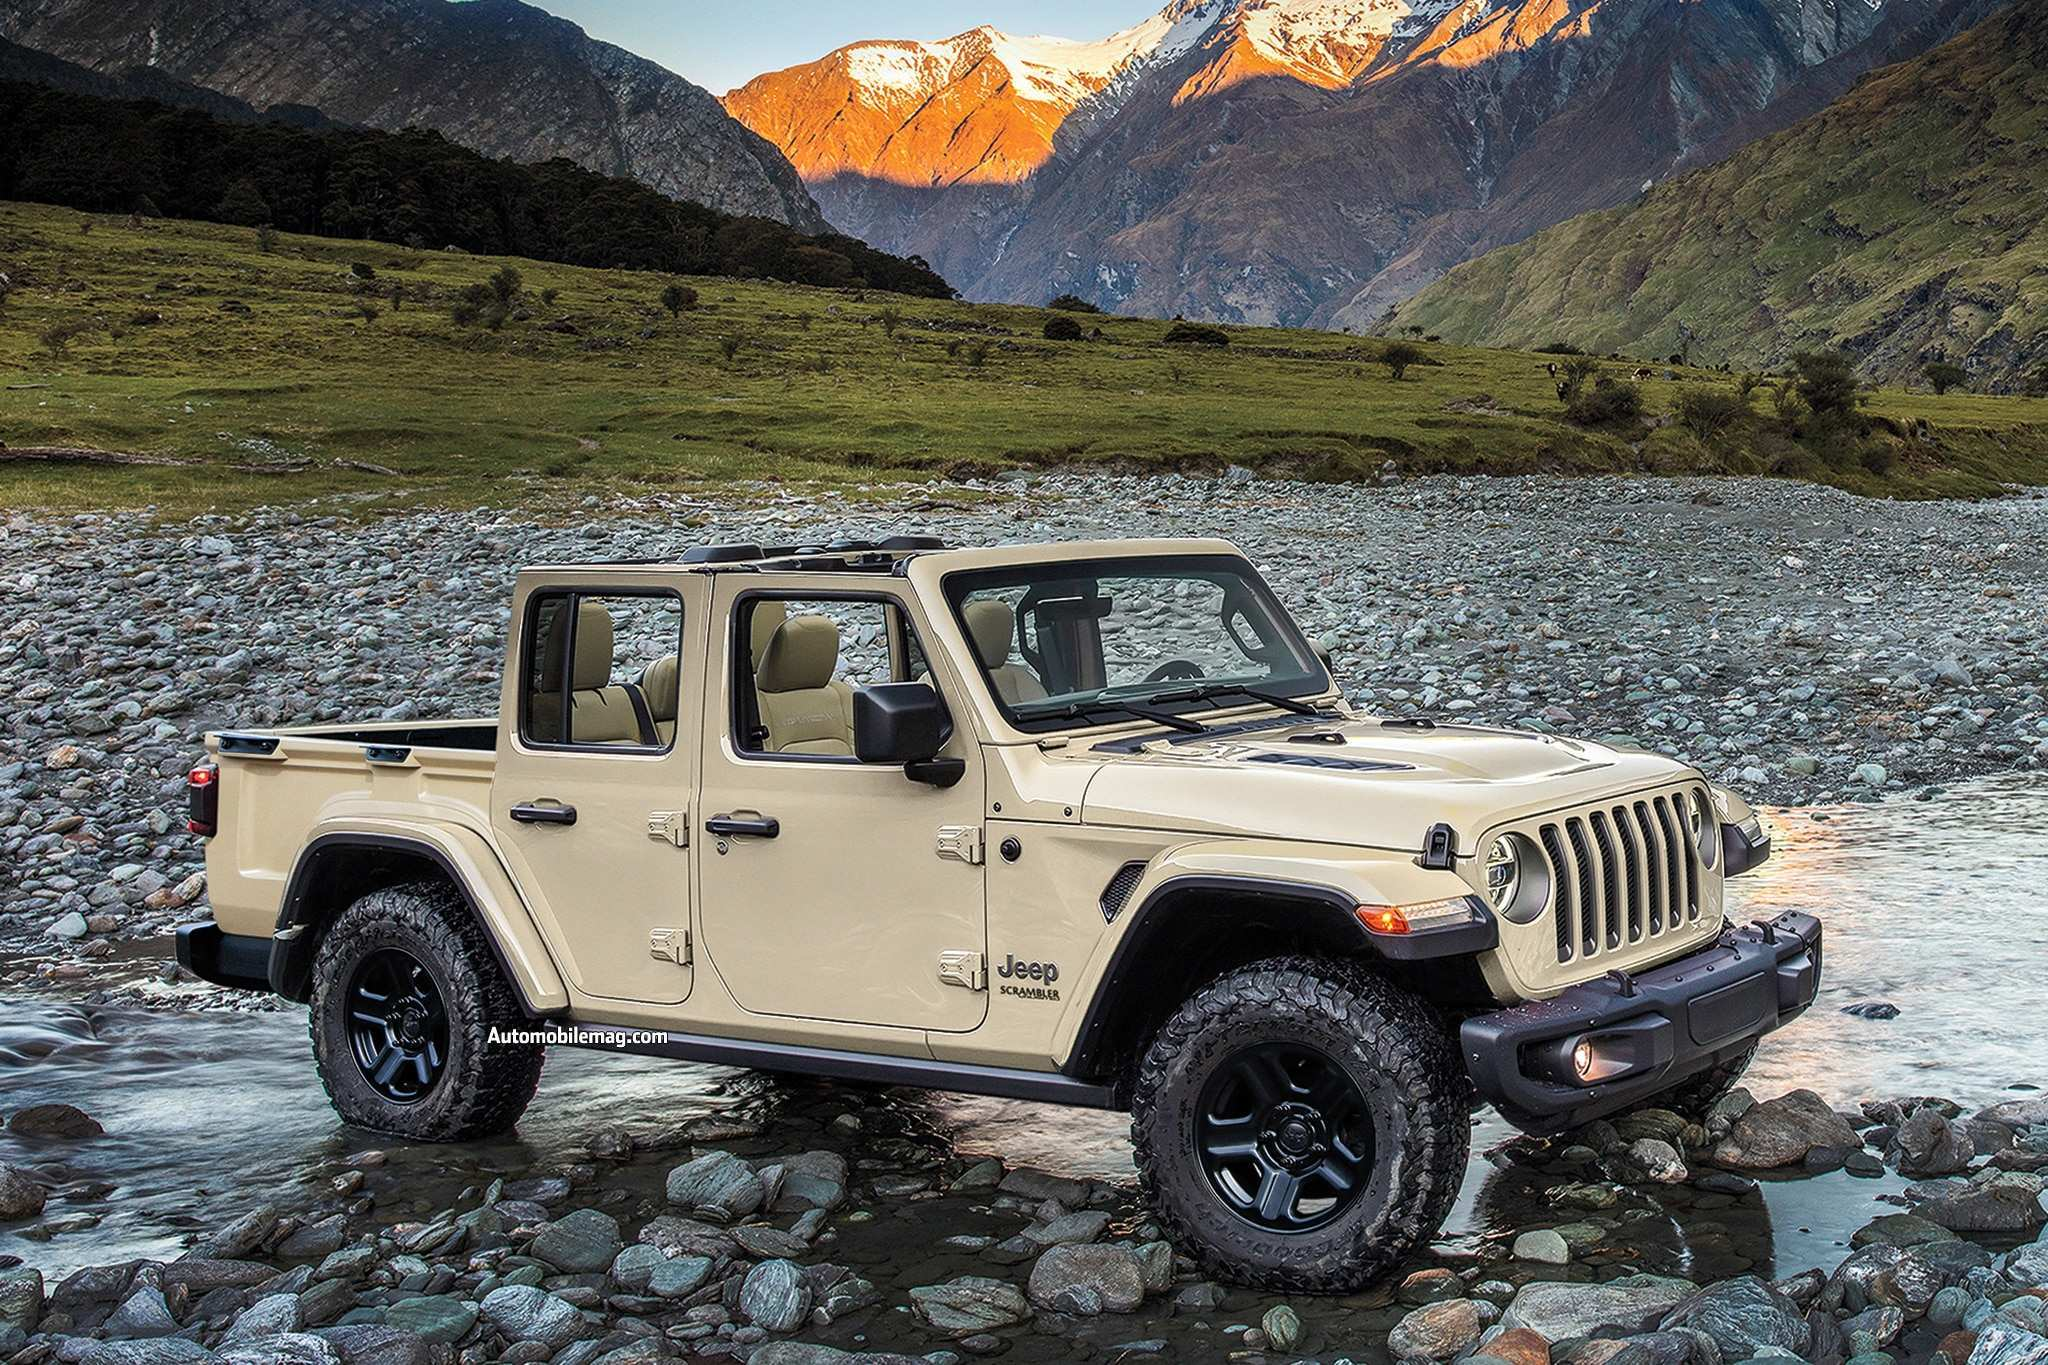 24 Great 2019 Jeep Scrambler Specs Price by 2019 Jeep Scrambler Specs